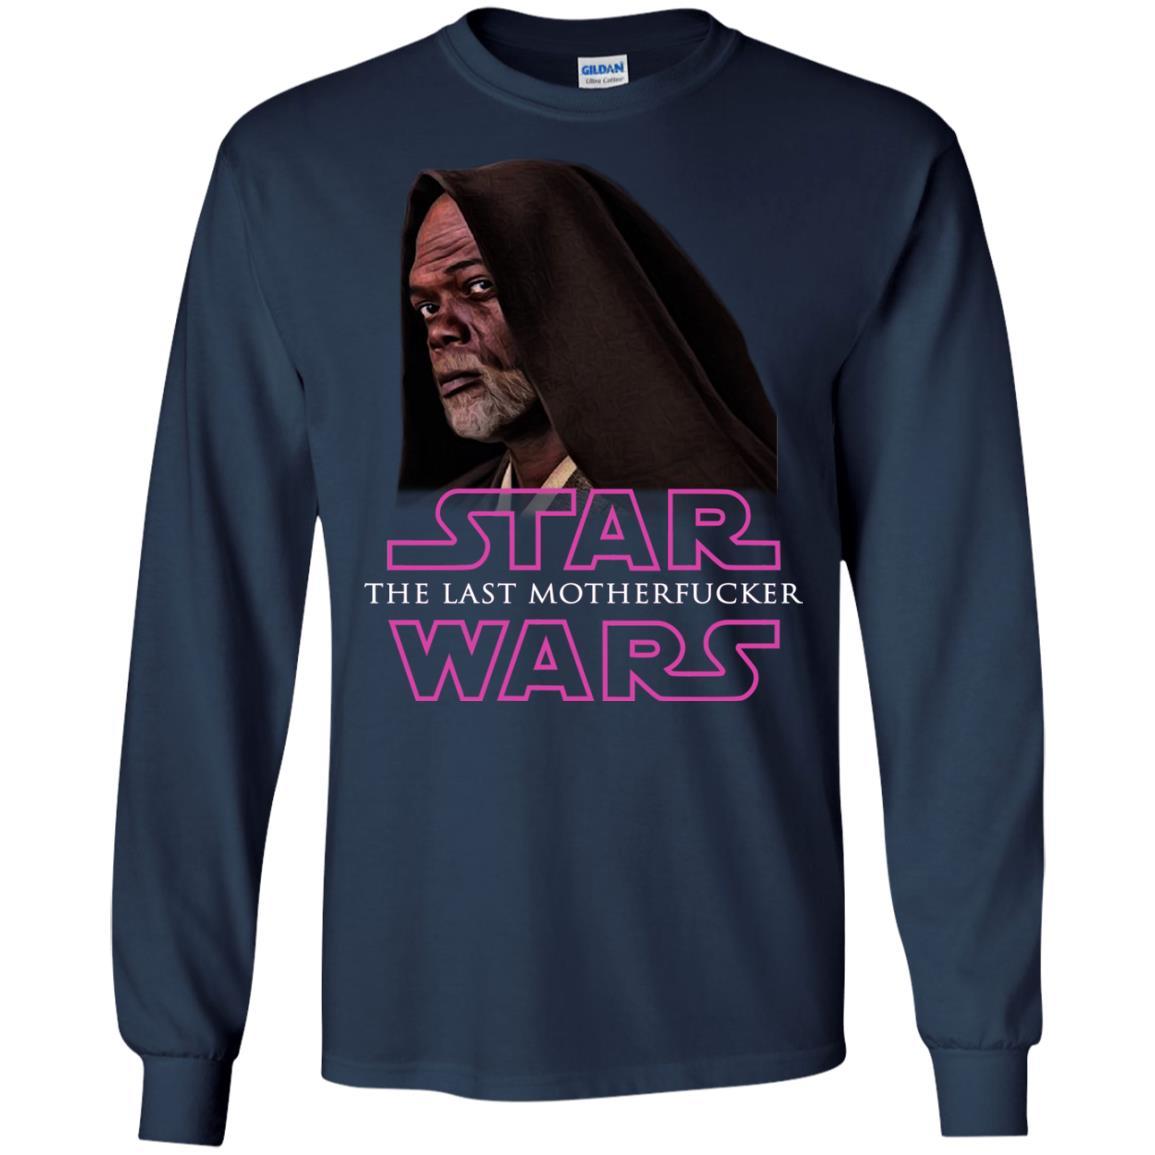 image 764 - Star The Last Motherfucker Wars Shirt, Sweatshirt, Hoodie